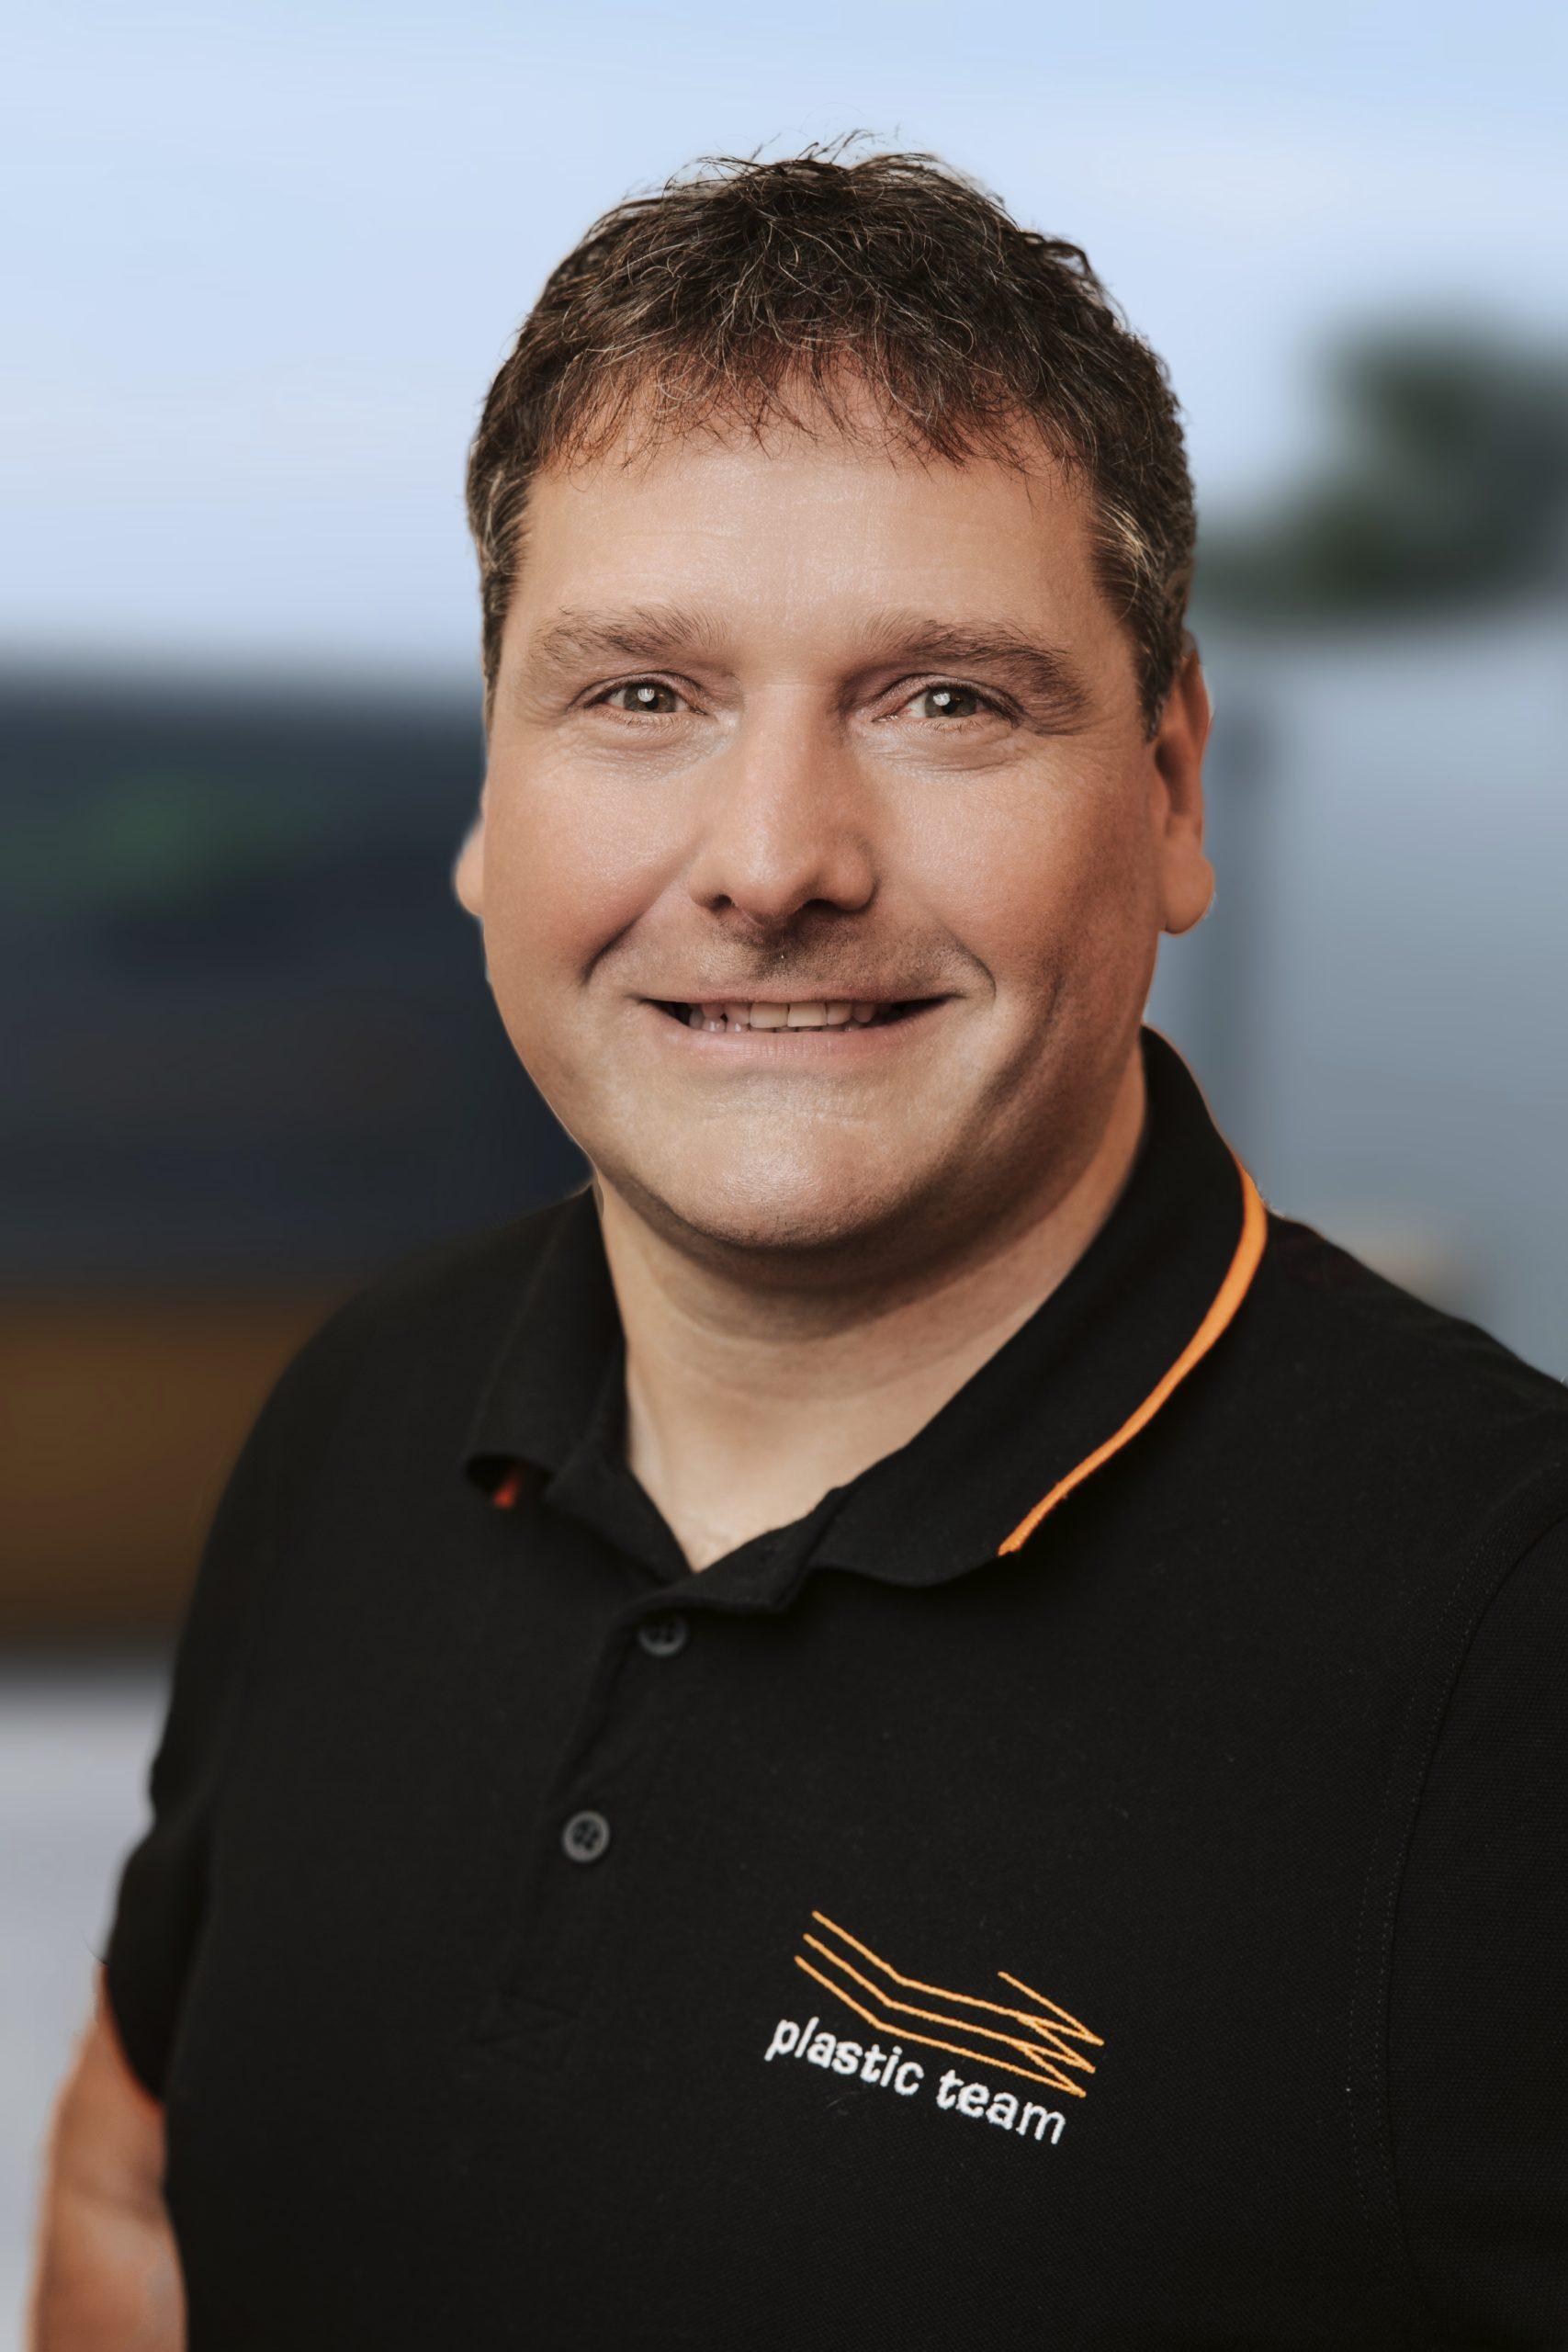 Michael Verhey